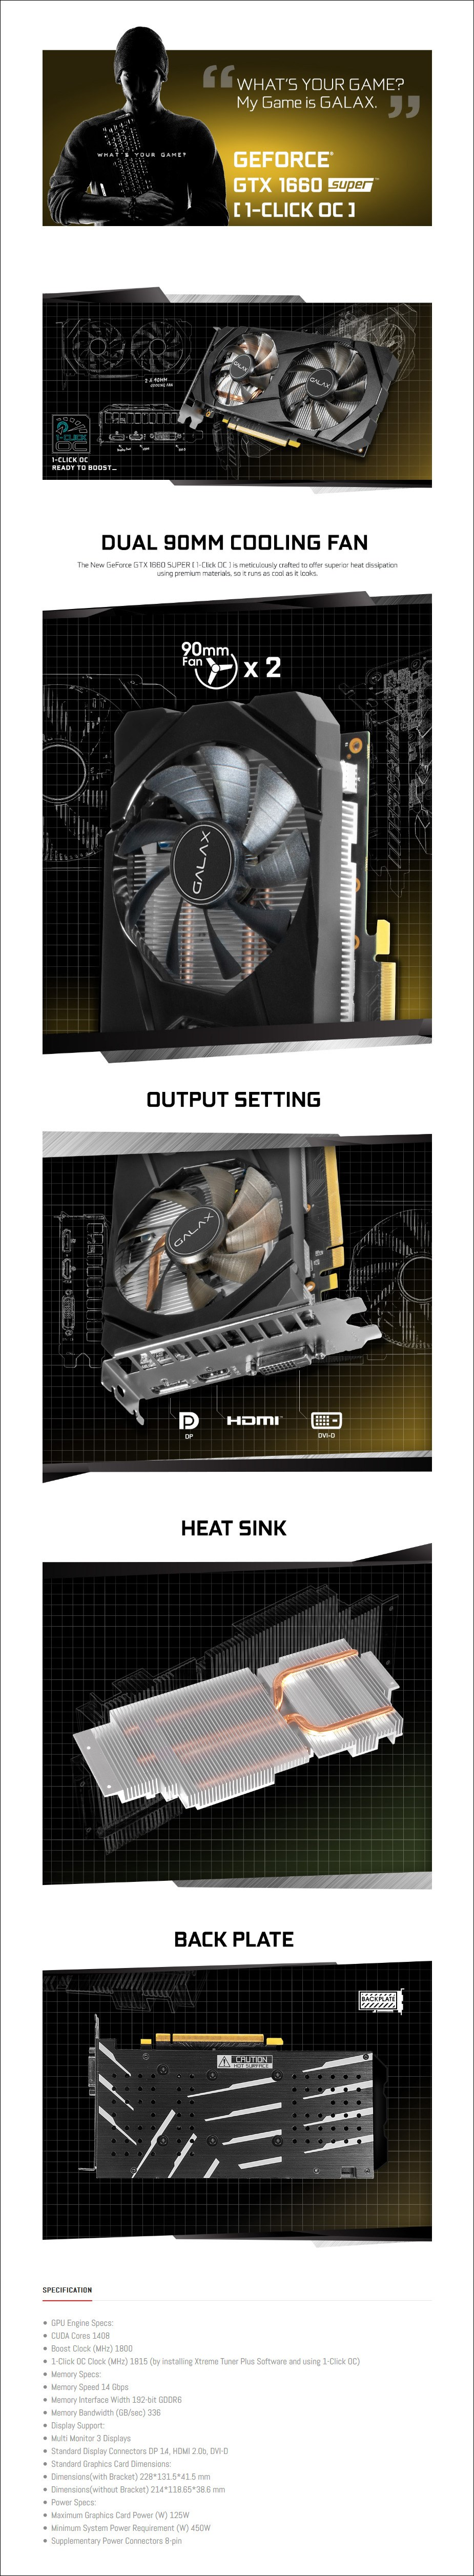 Galax GeForce GTX 1660 SUPER 1-Click OC 6GB Video Card - Overview 1